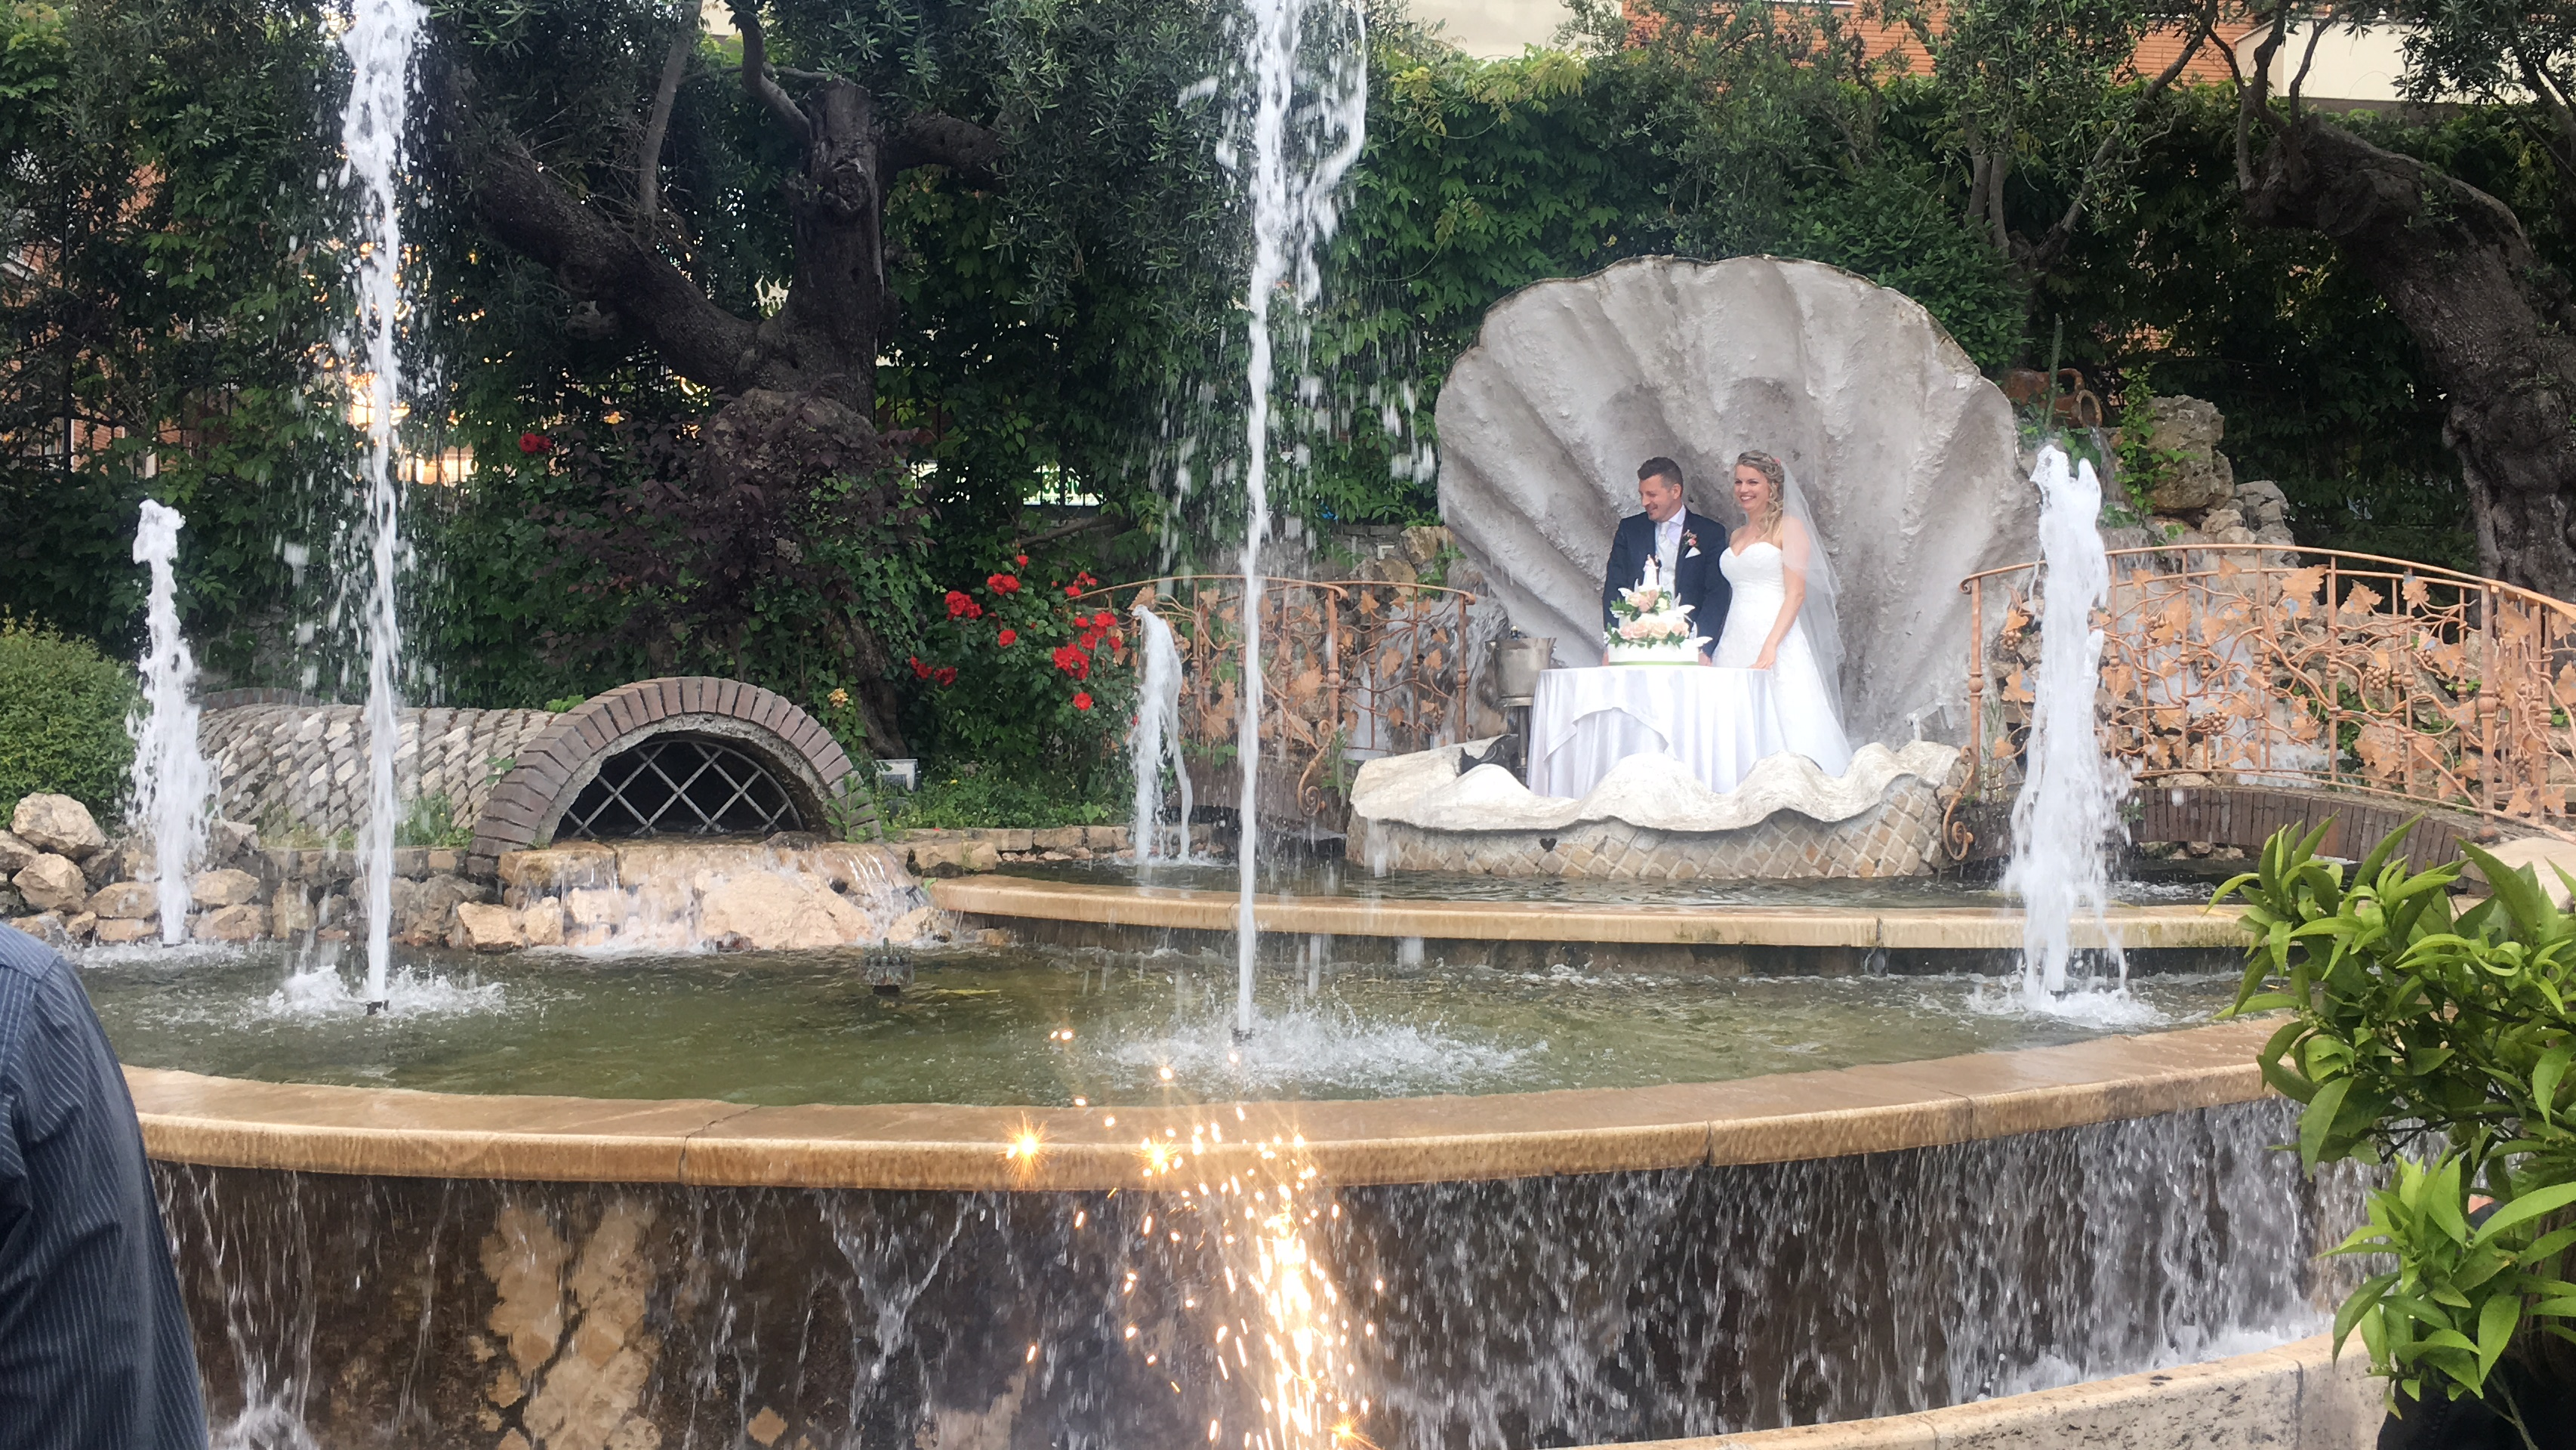 Фото 1 свадьба в Риме | Лидия и Оттавио | ведущая в Италии - Катрин Моро